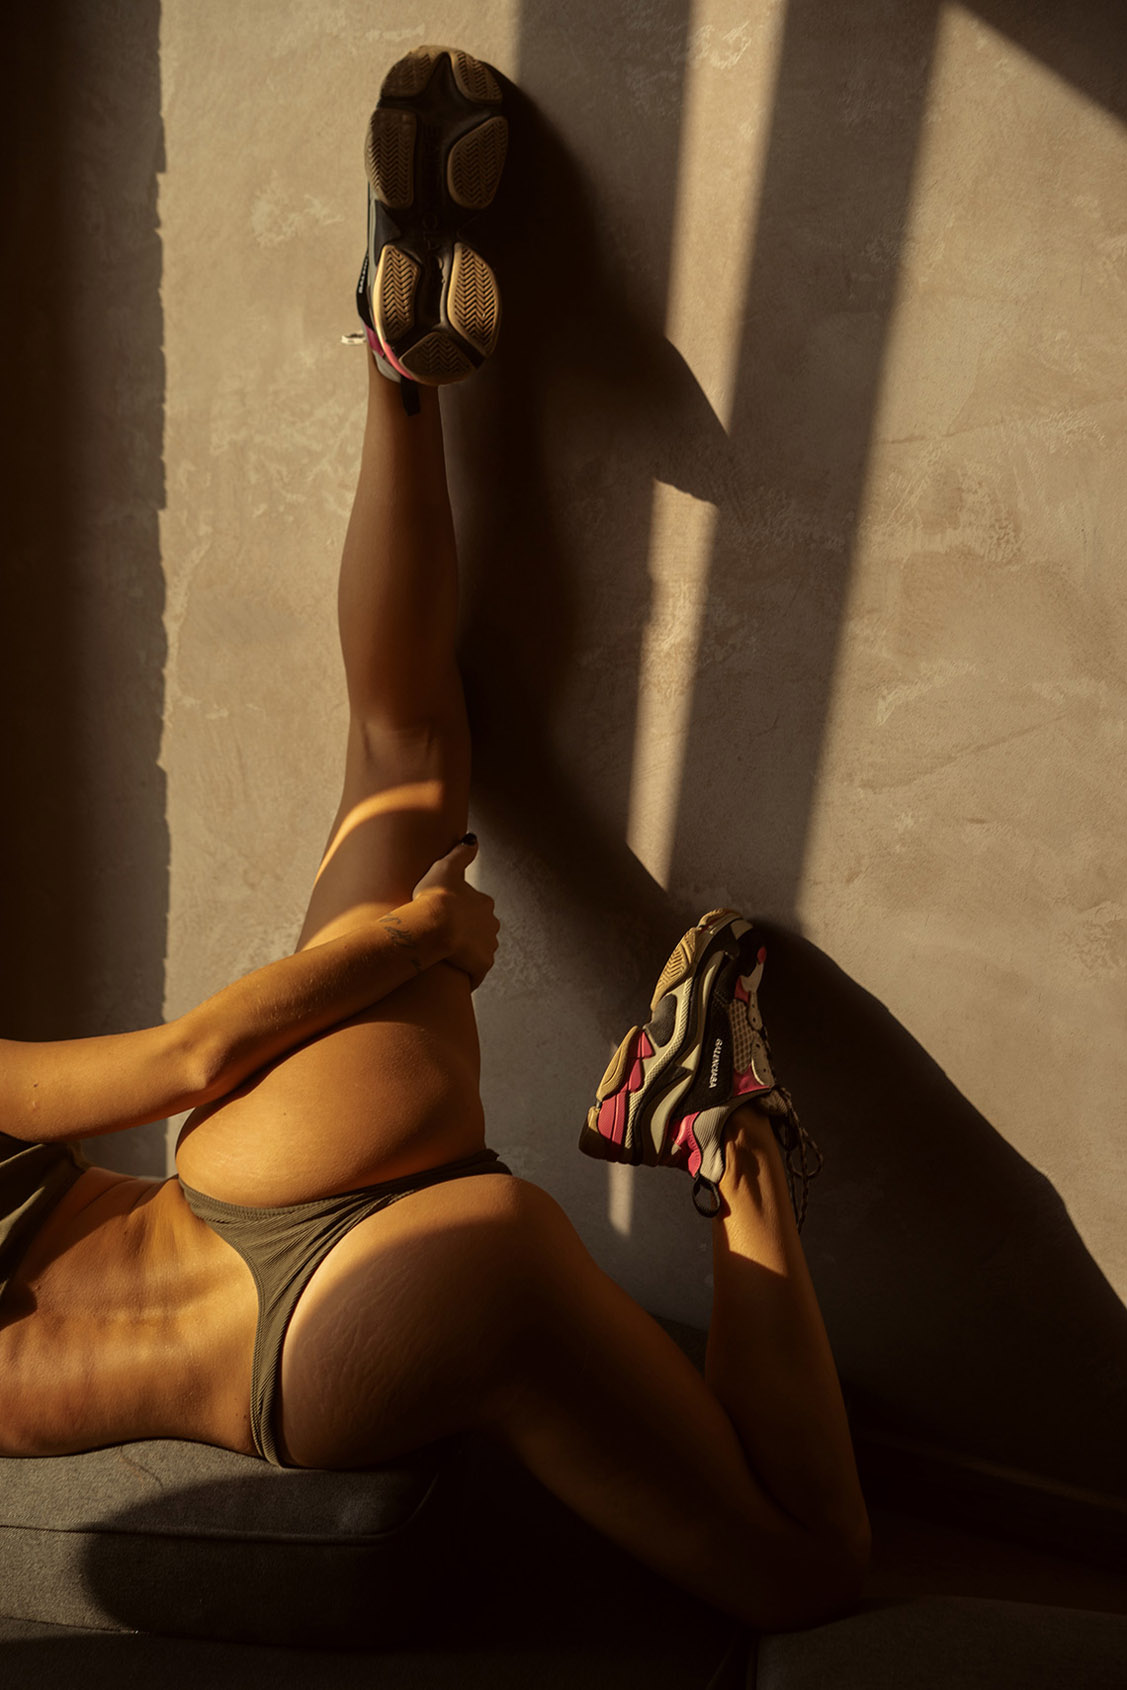 Сексуальная Наташа Грехова / фото 12